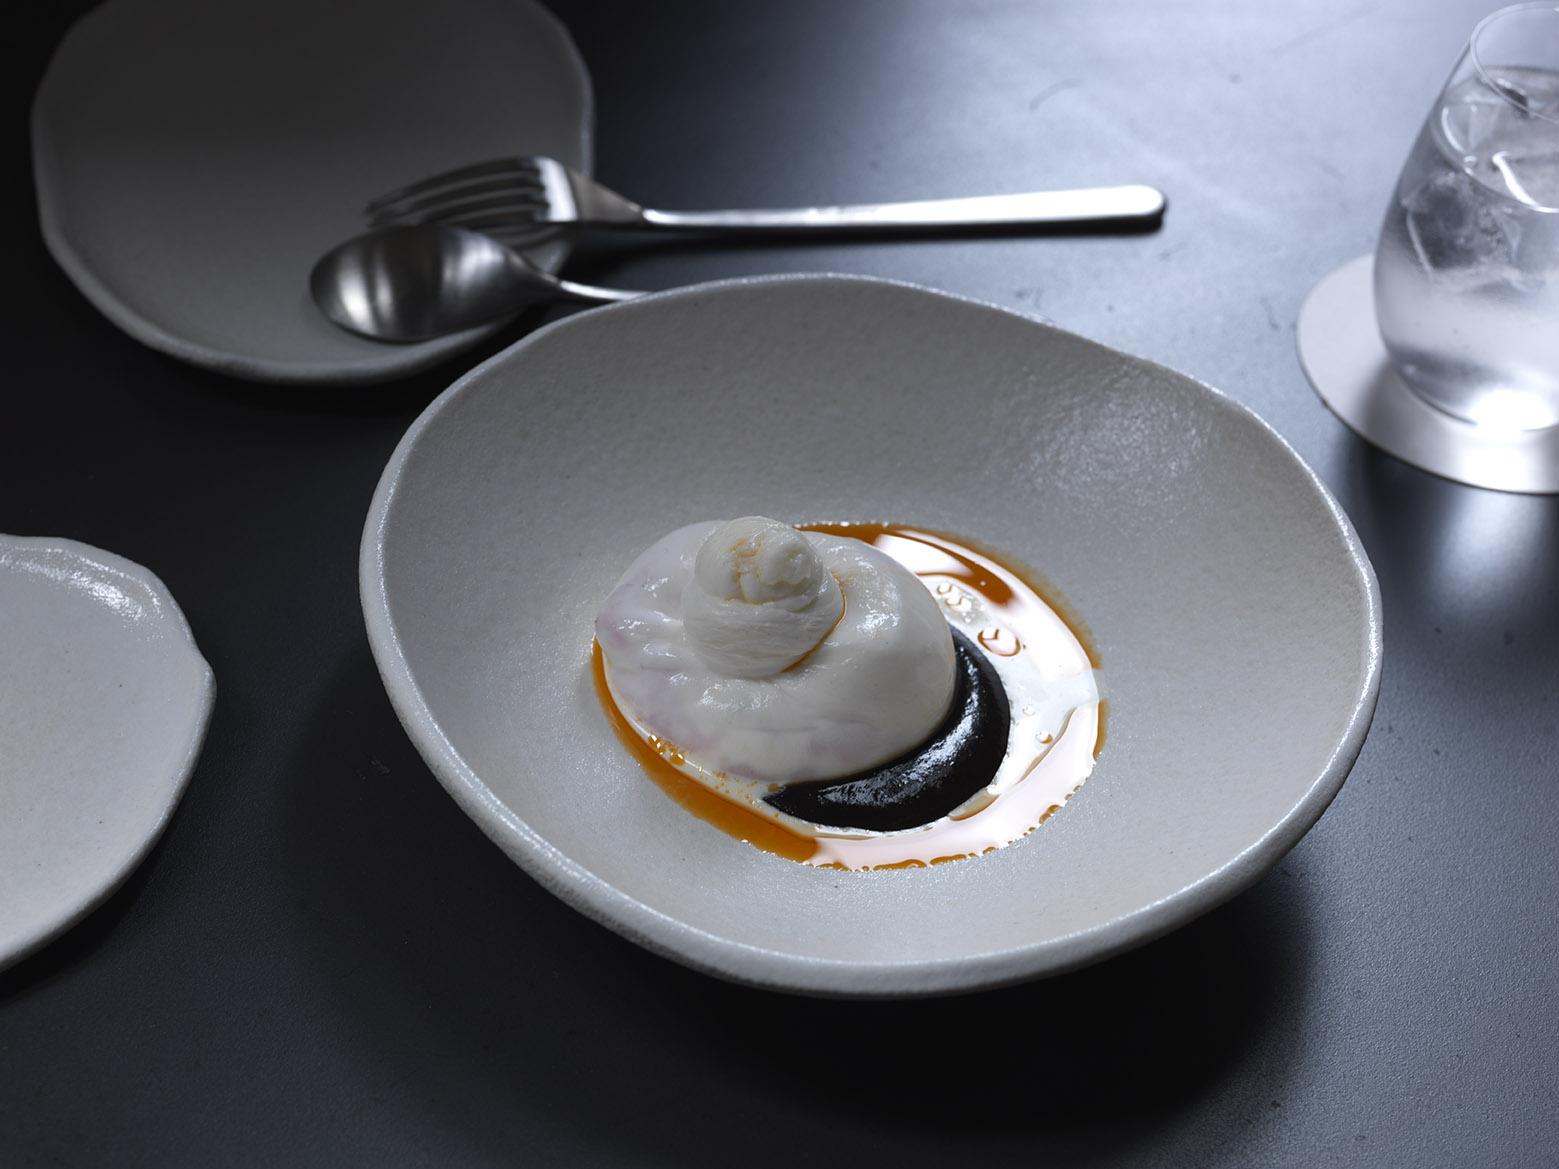 burrata and shellfish oil dish from Automata